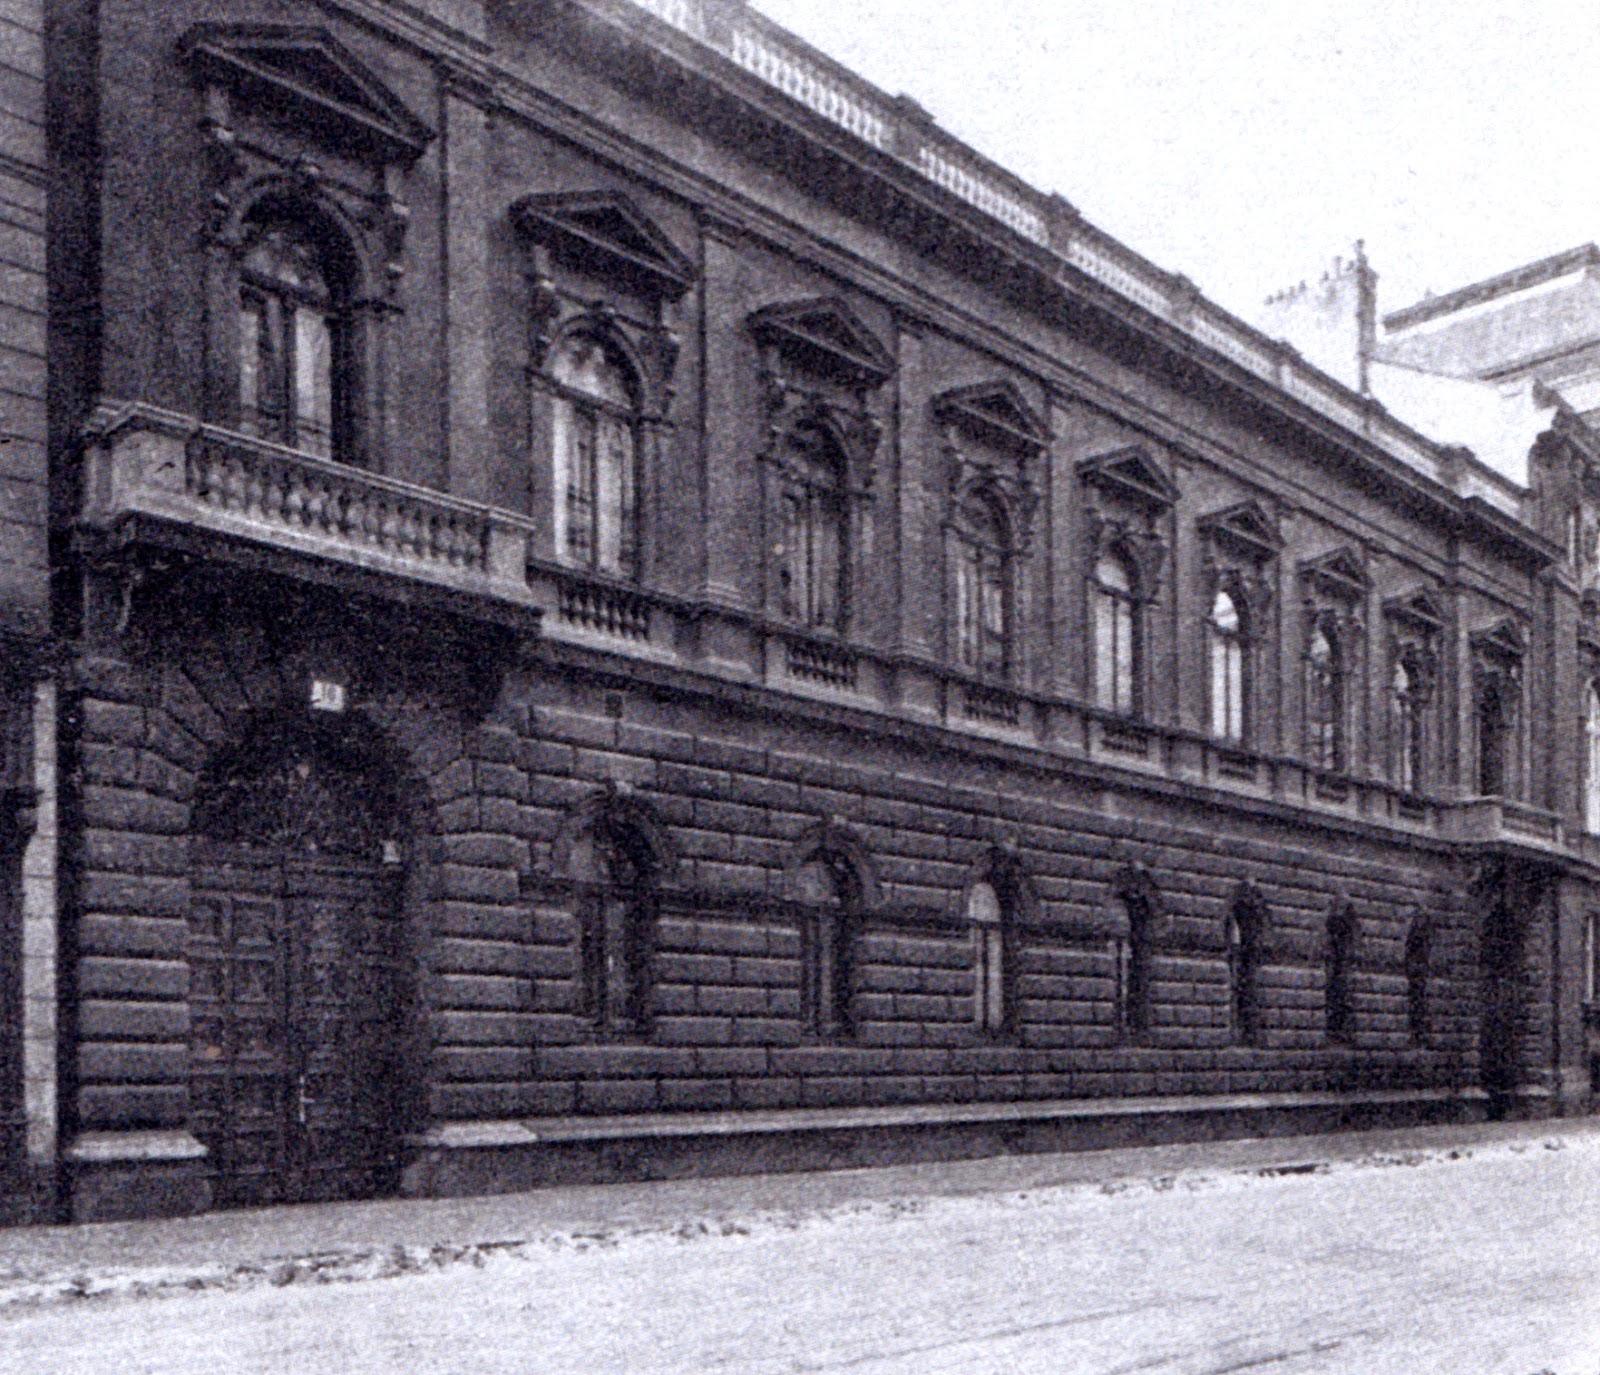 https://upload.wikimedia.org/wikipedia/commons/f/fb/Palais_Wittgenstein_03.jpg